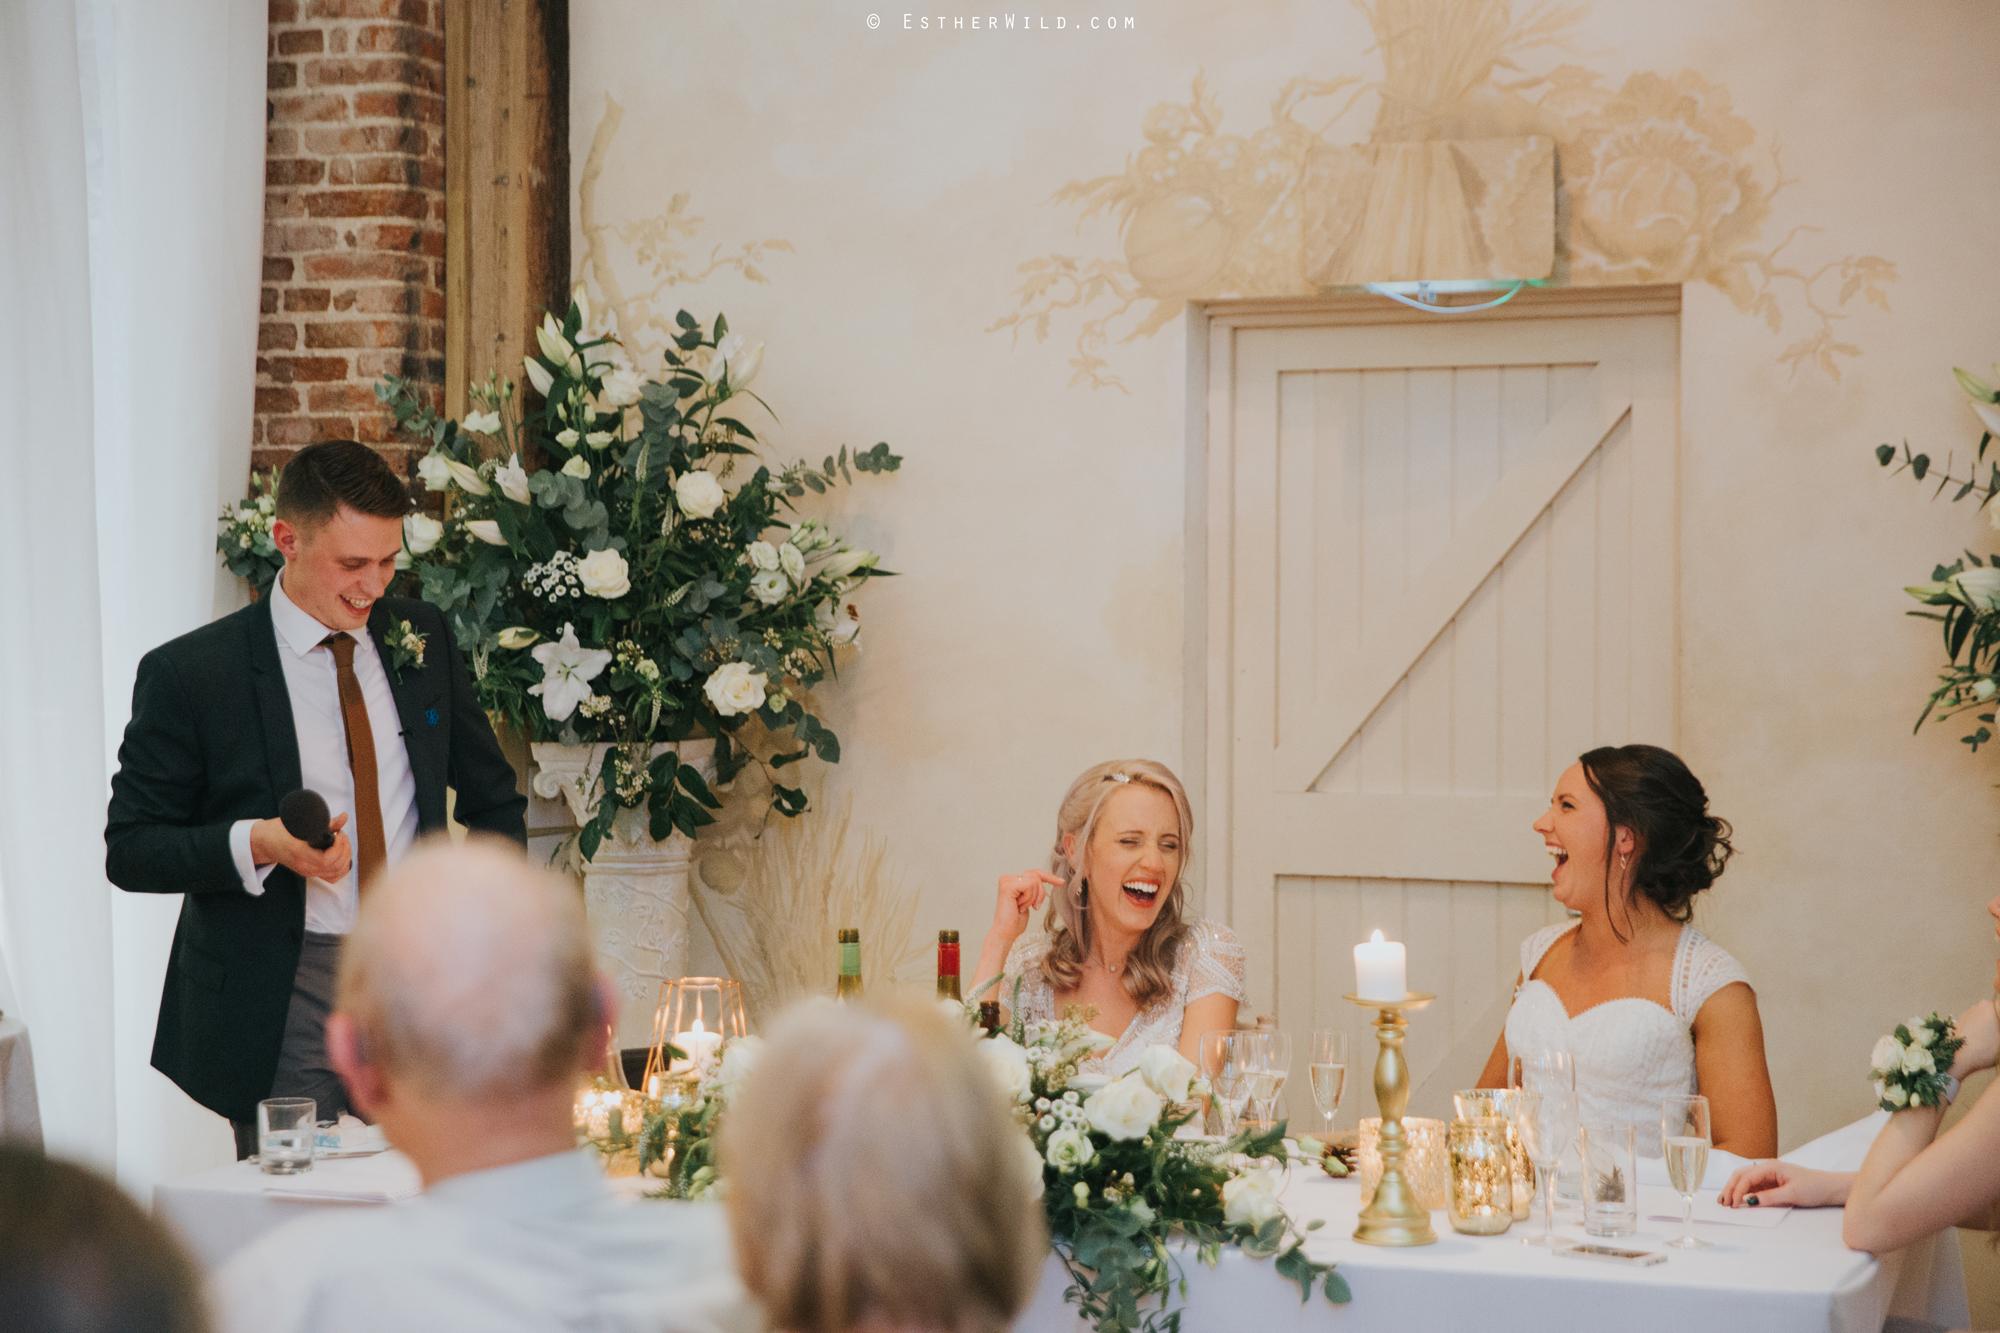 Elms_Barn_Weddings_Suffolk_Photographer_Copyright_Esther_Wild_IMG_2881.jpg